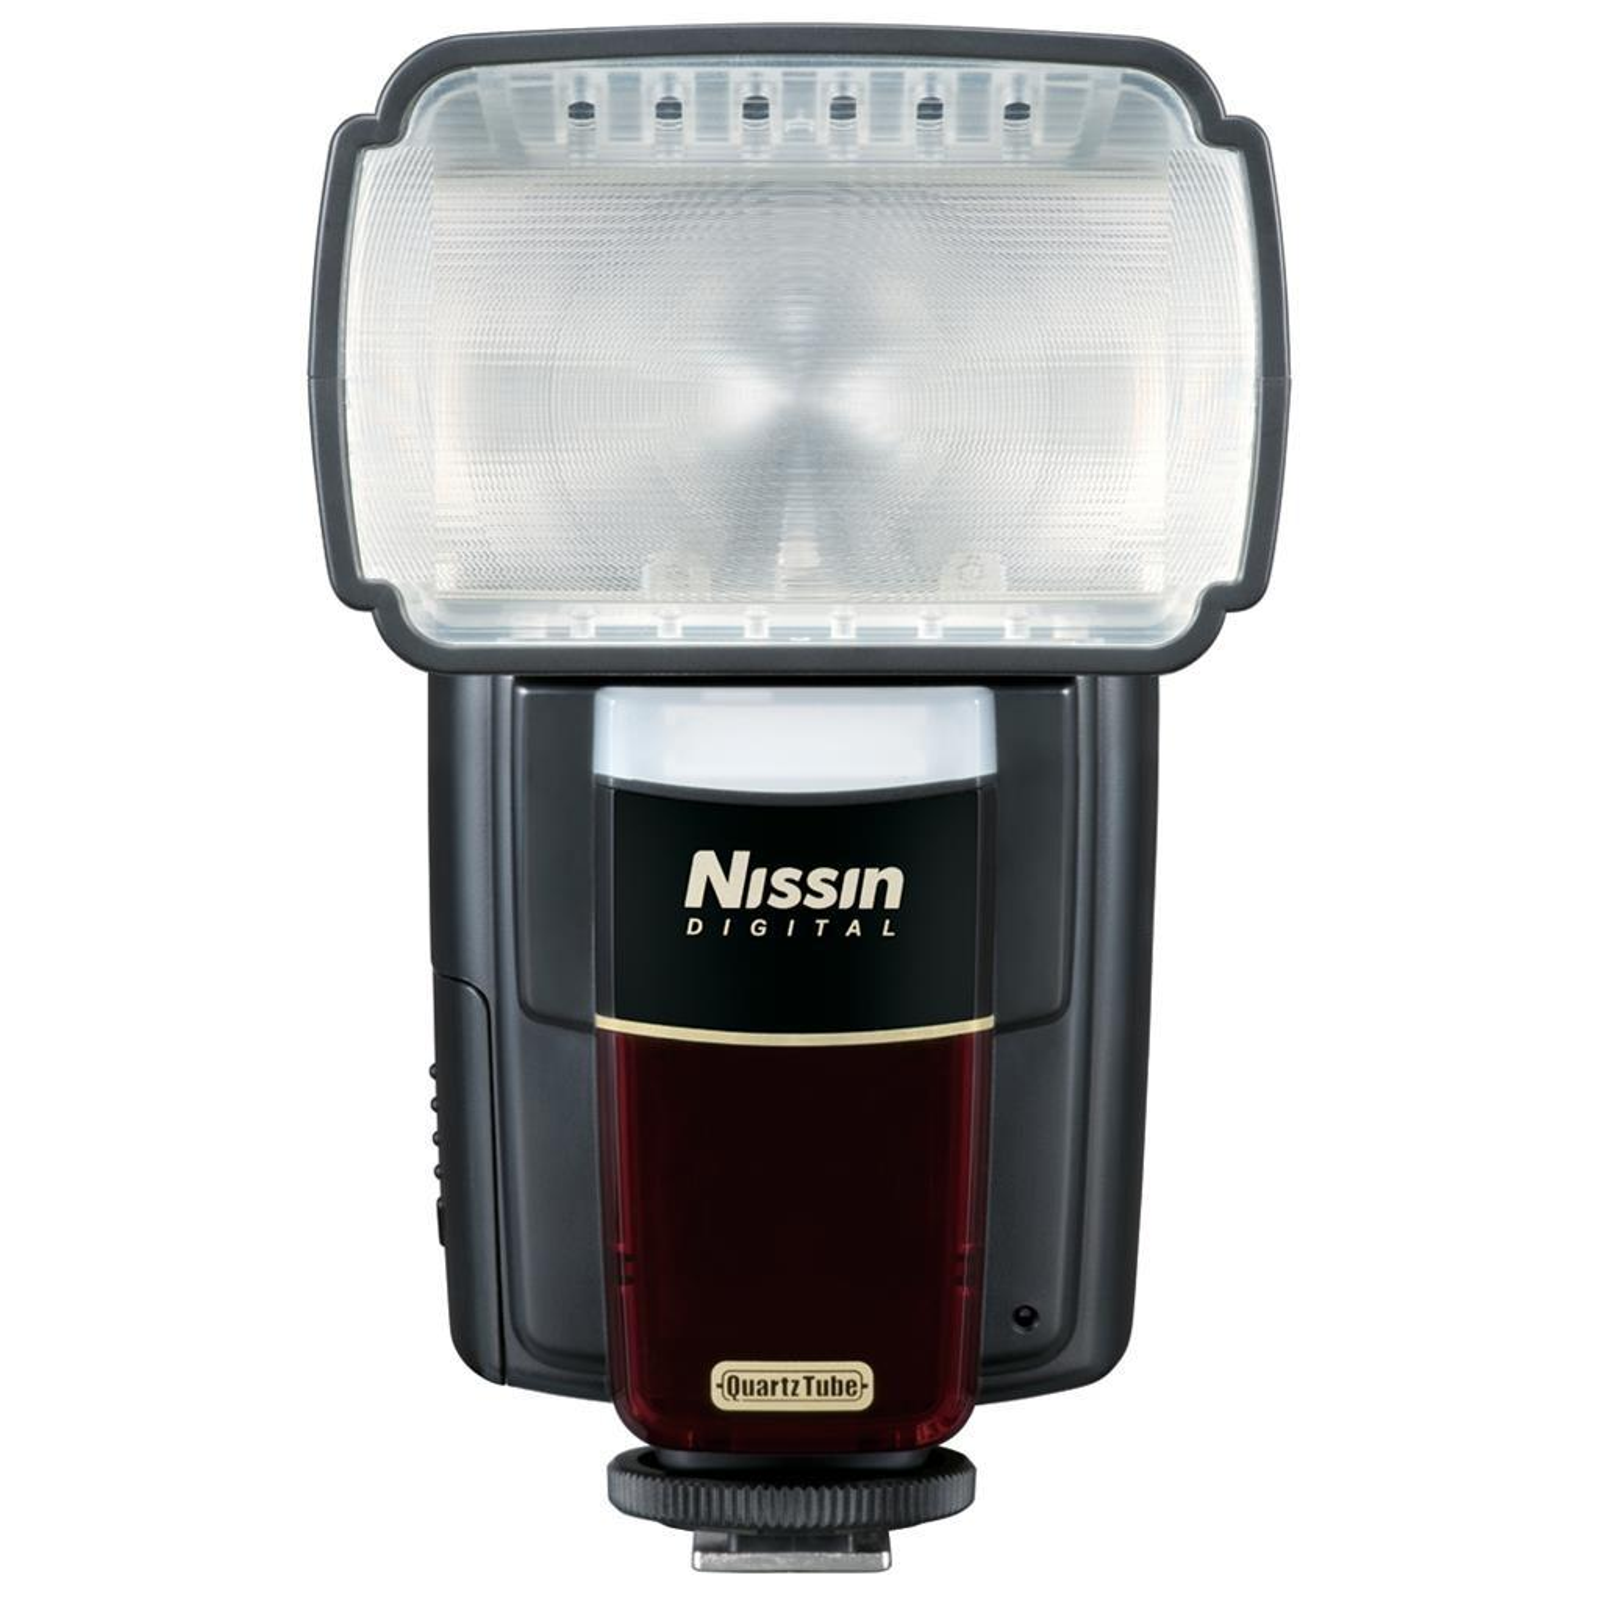 Вспышка Nissin MG8000 Nikon (NI-N065)